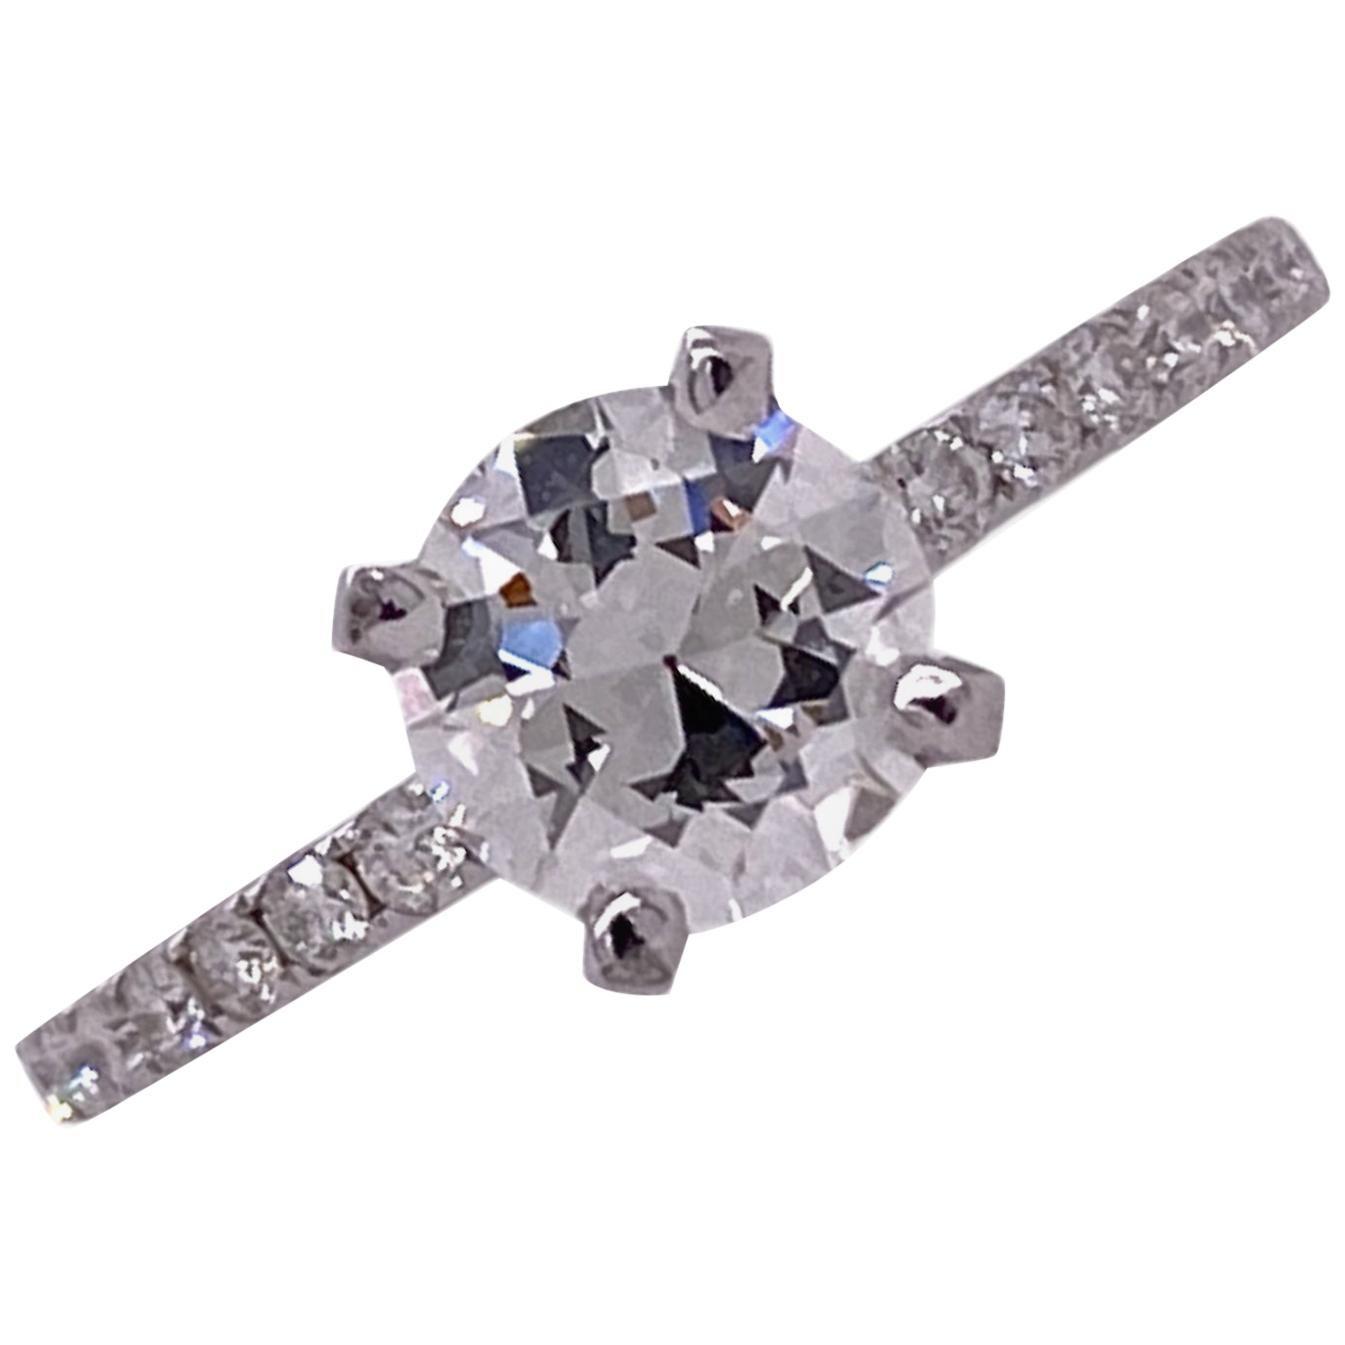 .92 Carat Diamond Solitaire Engagement Ring GIA I/VS1 18 Karat White Gold